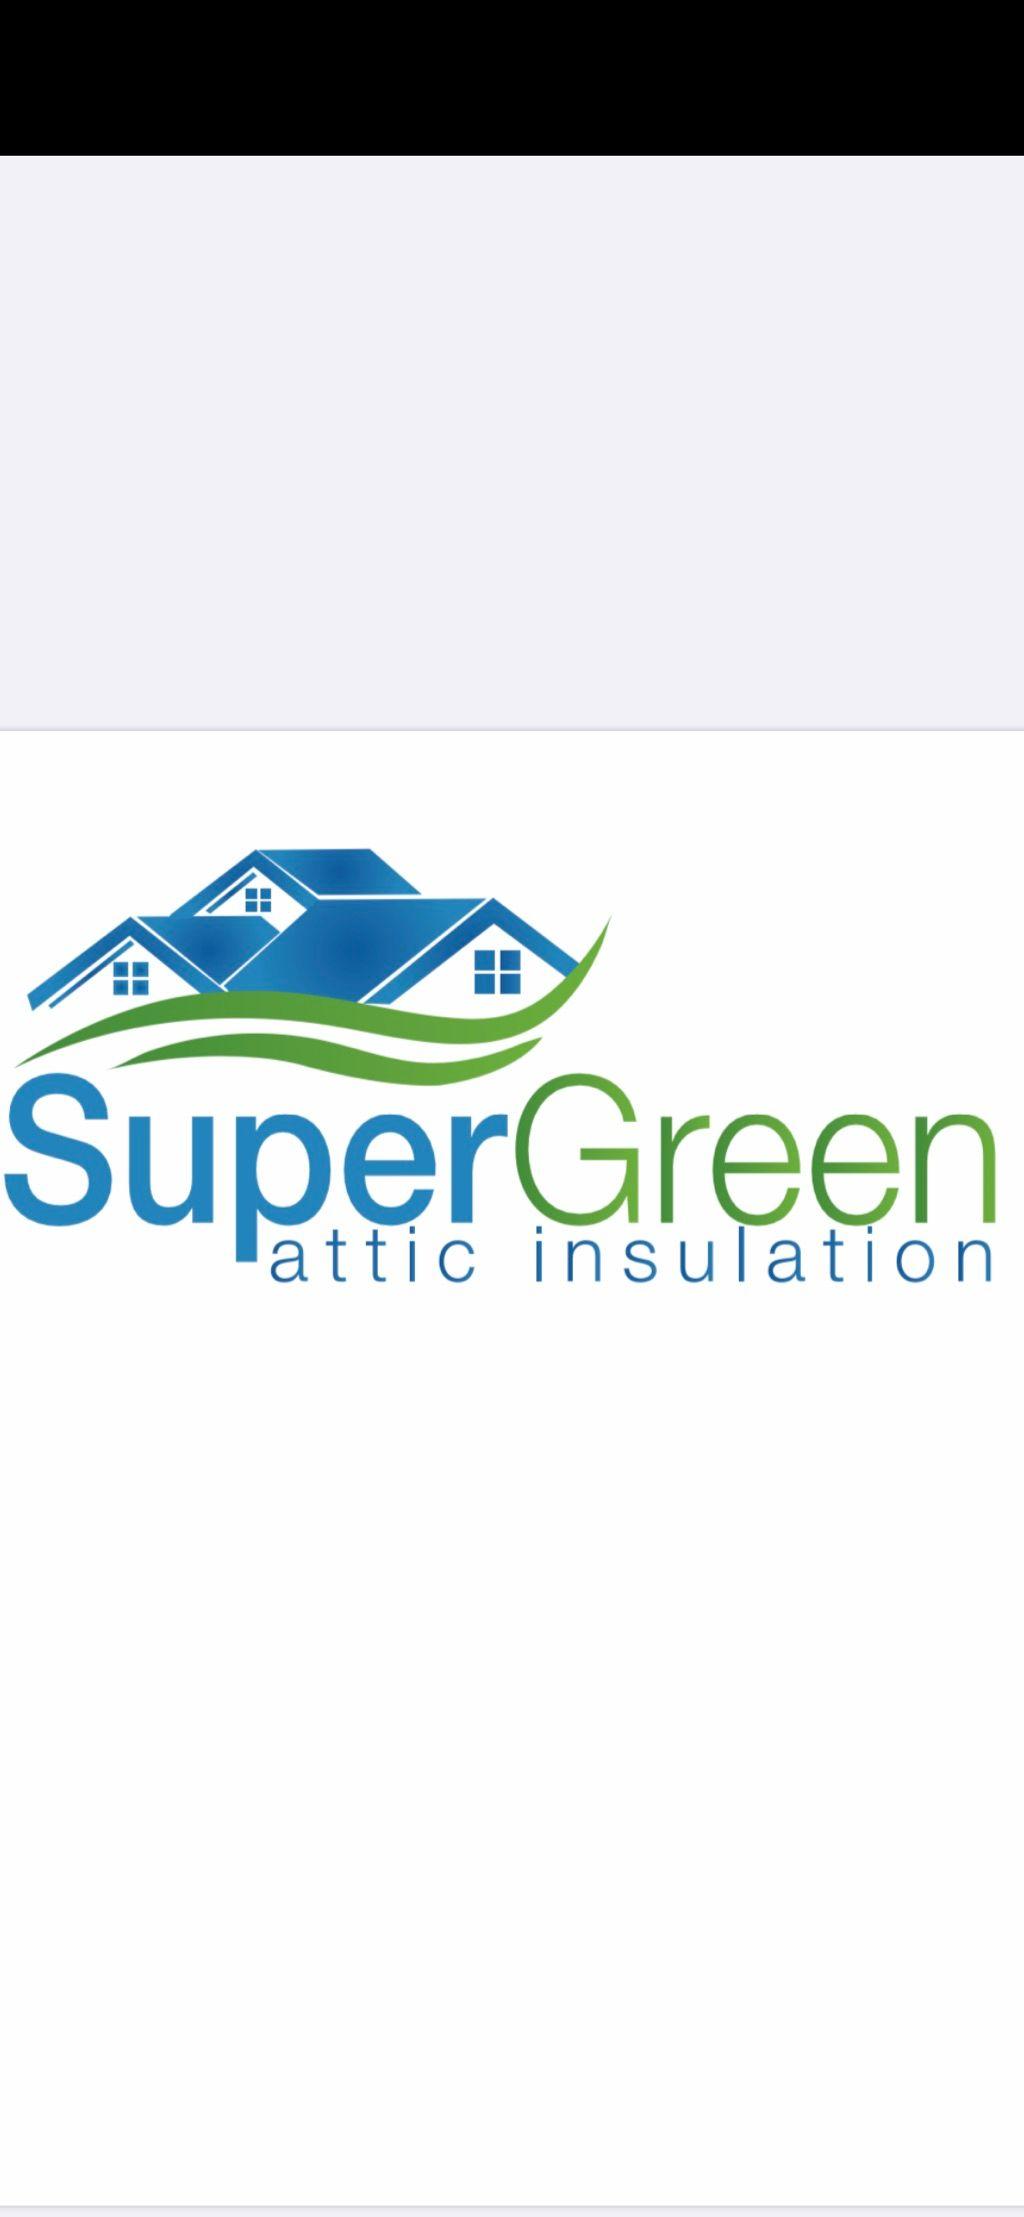 SuperGreen Attic Insulation